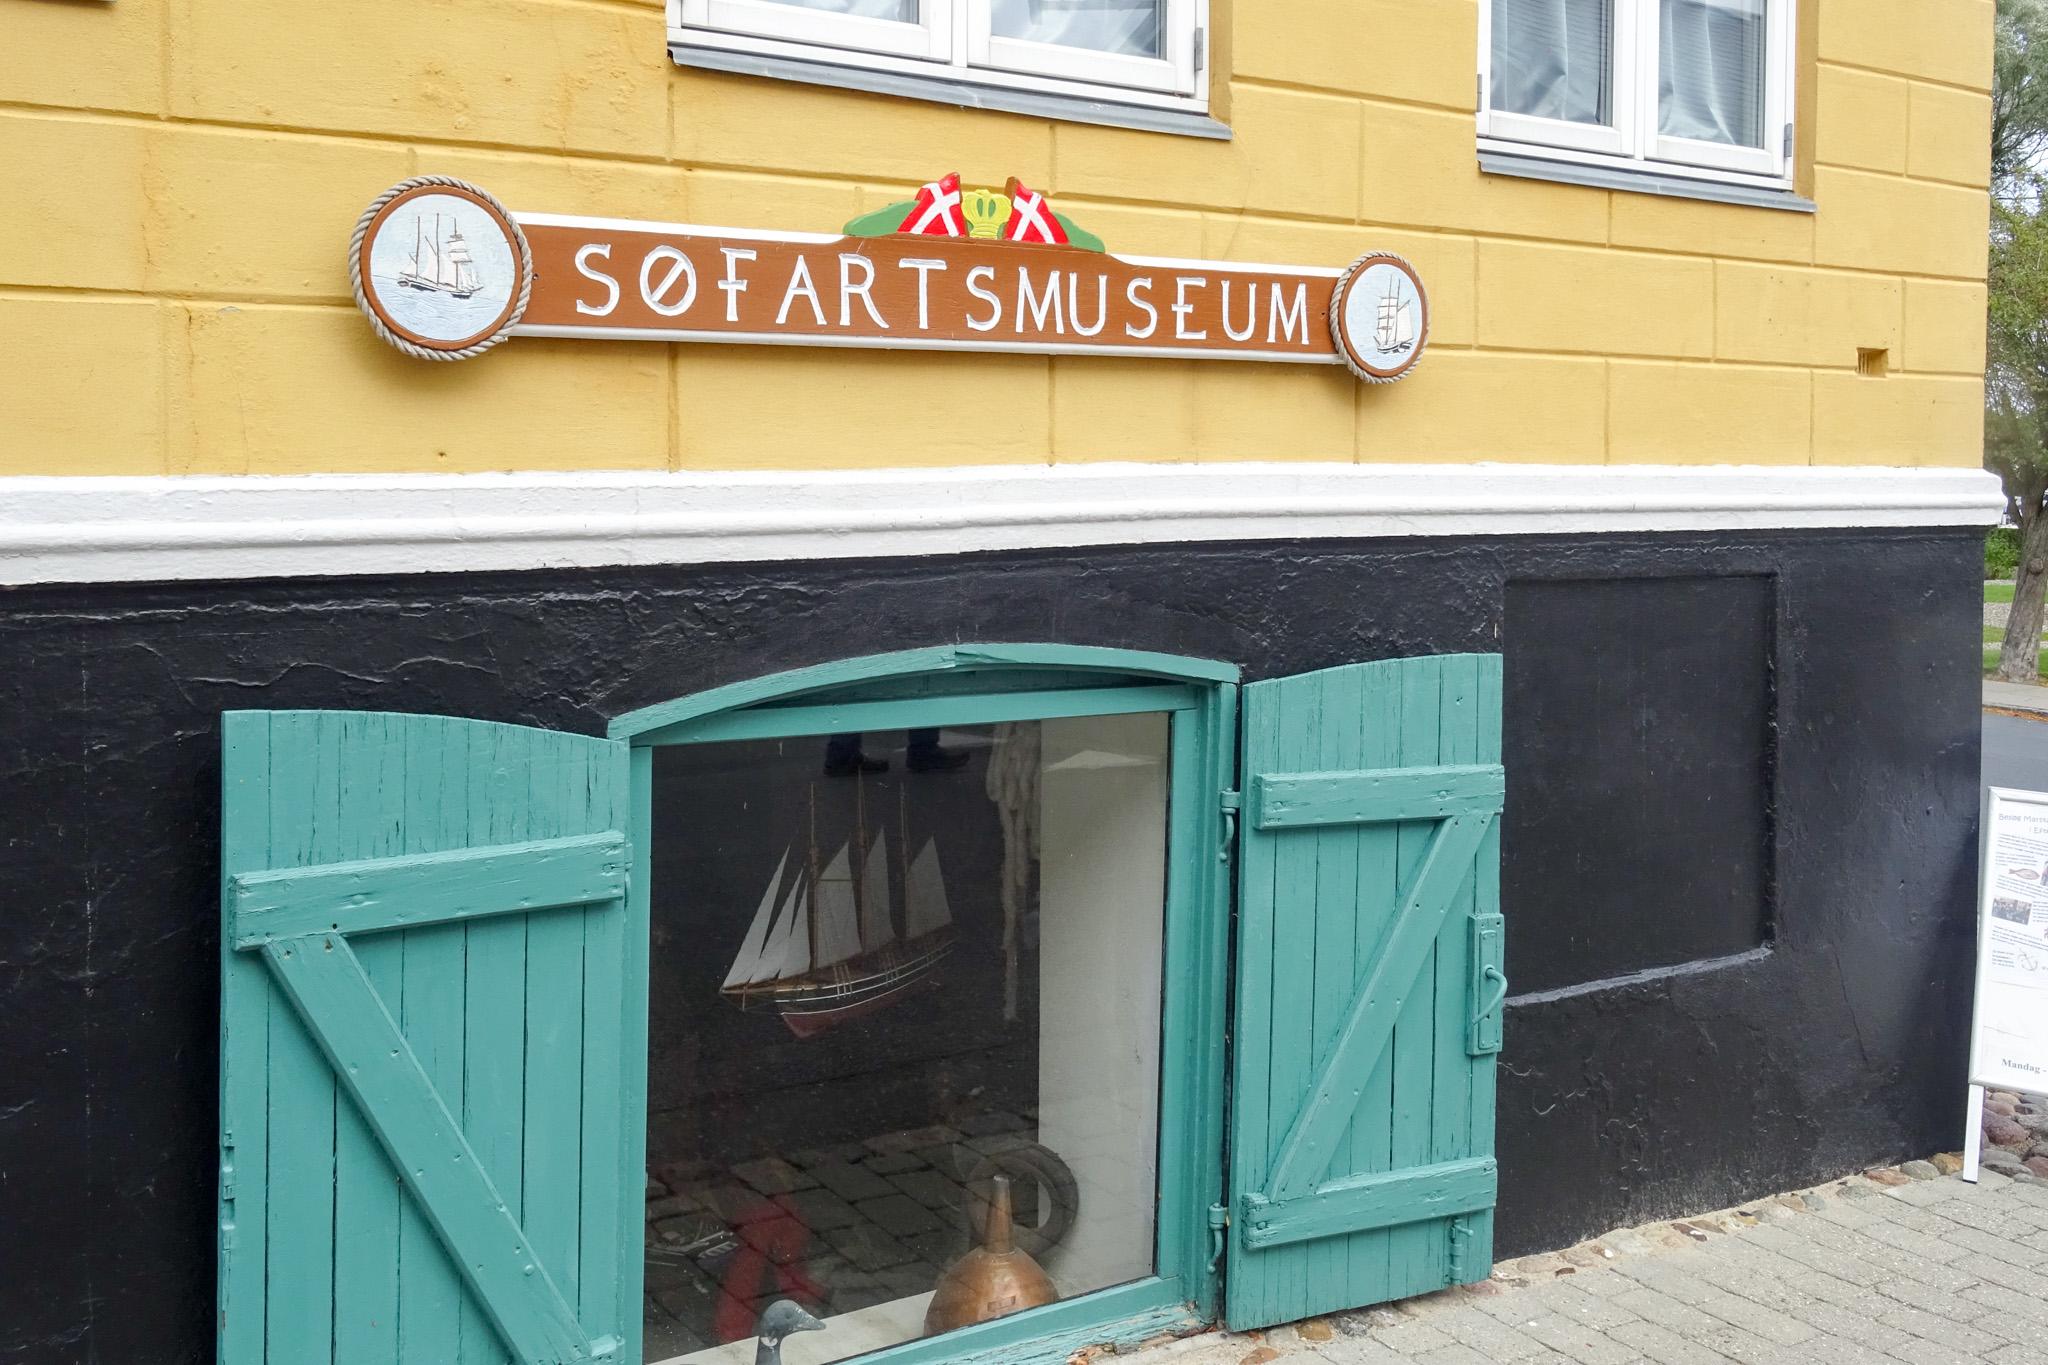 Seefahrtsmuseum von Marstal